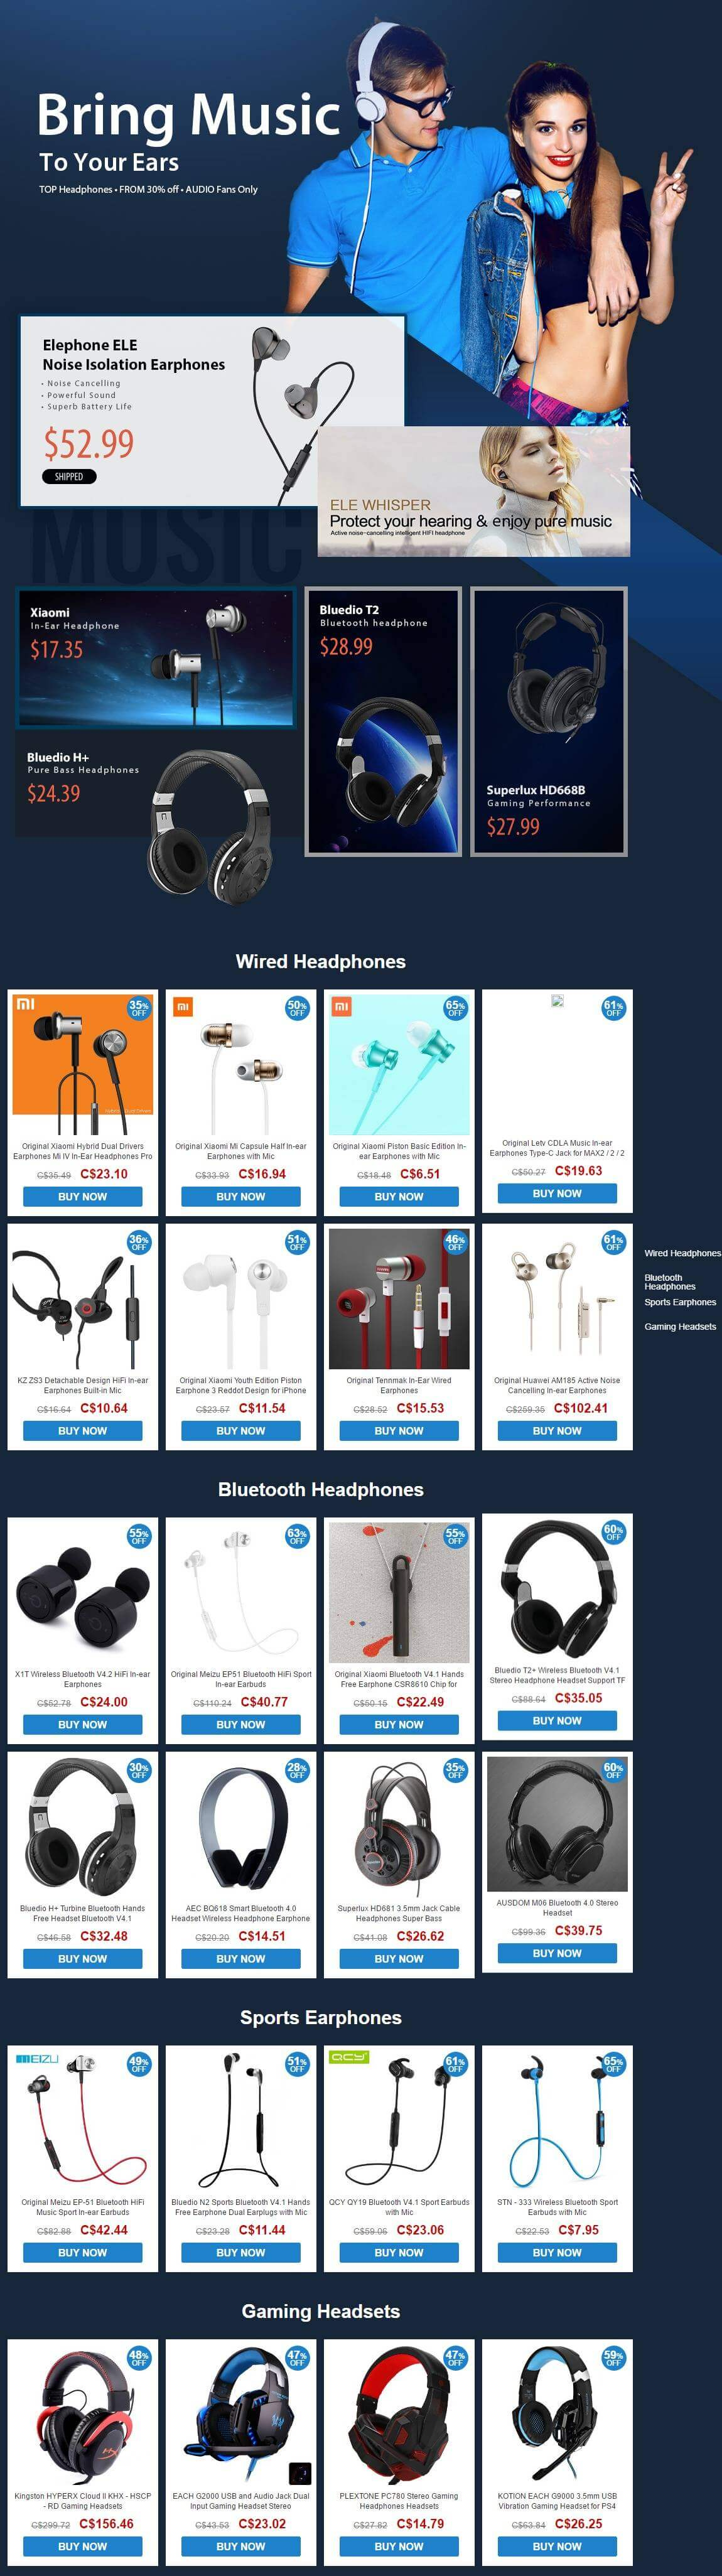 full-product-list-top-headphones-and-earphones-promotional-sale-1